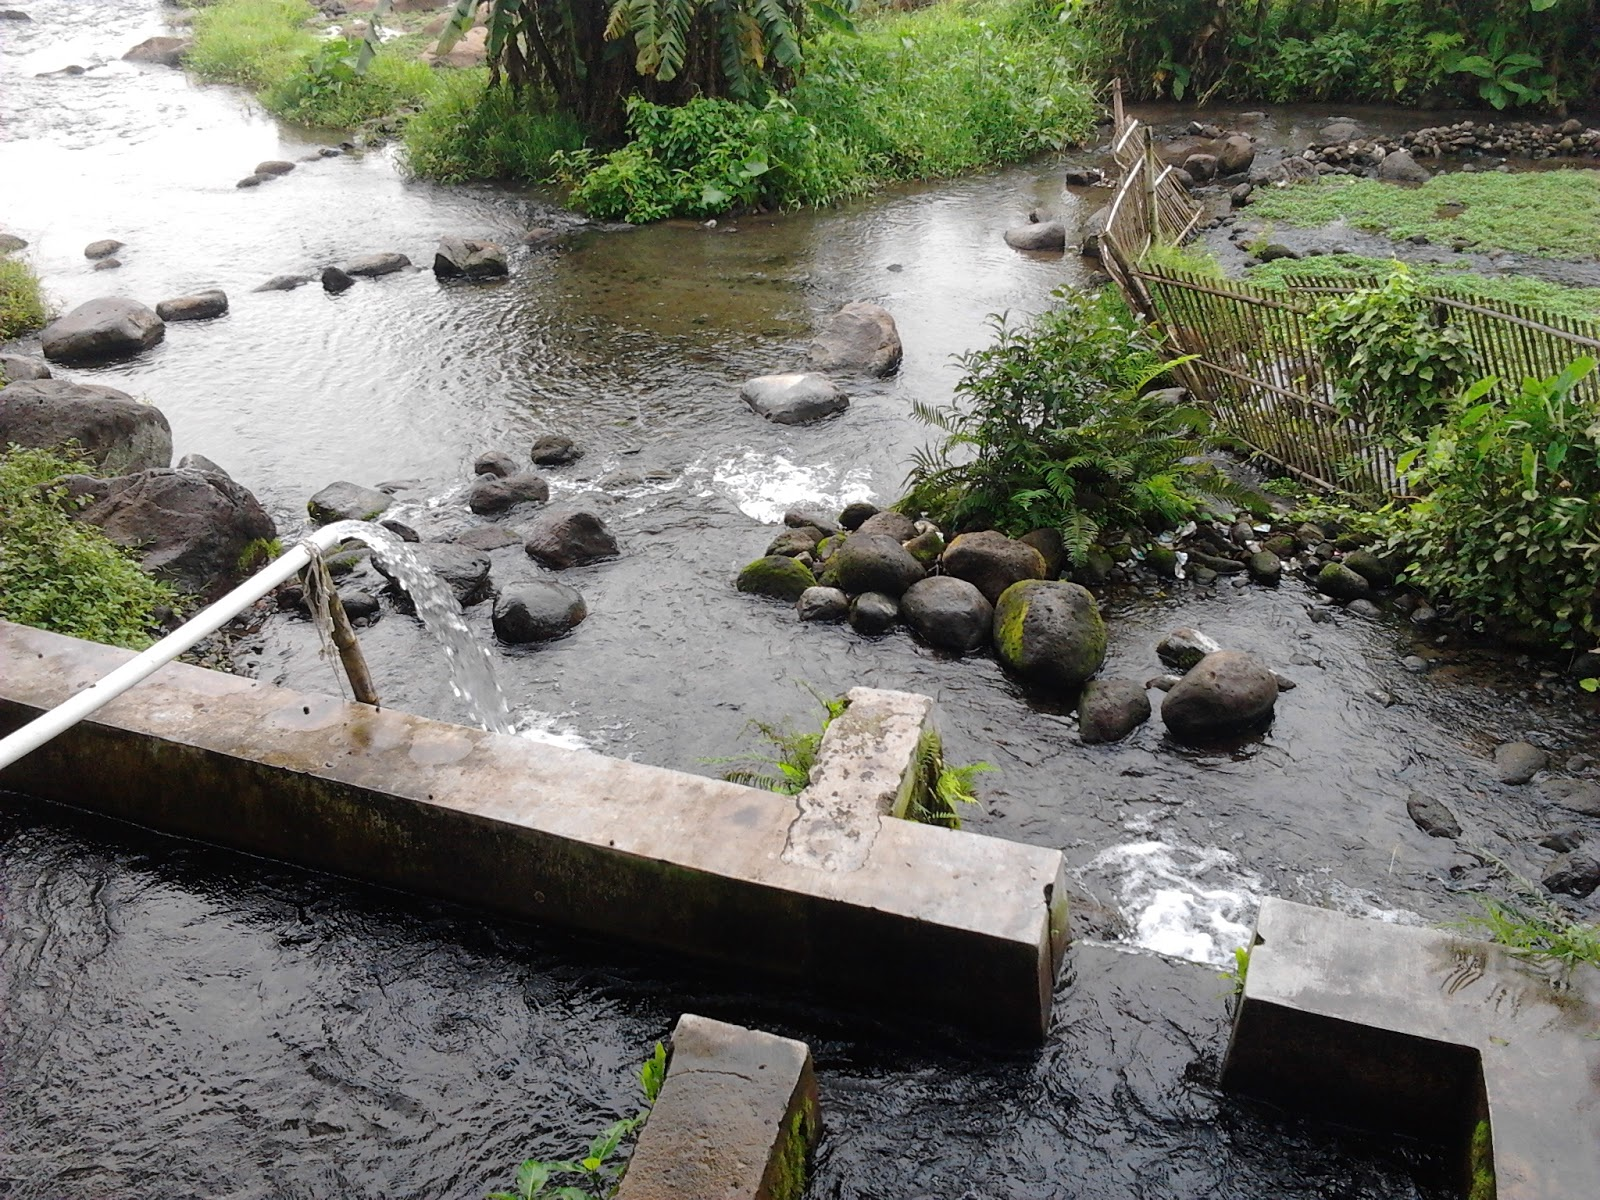 Indrastomo Umbul Nilo Lokasi Wisata Tersembunyi Kurang Promosi Pancuran Biasa